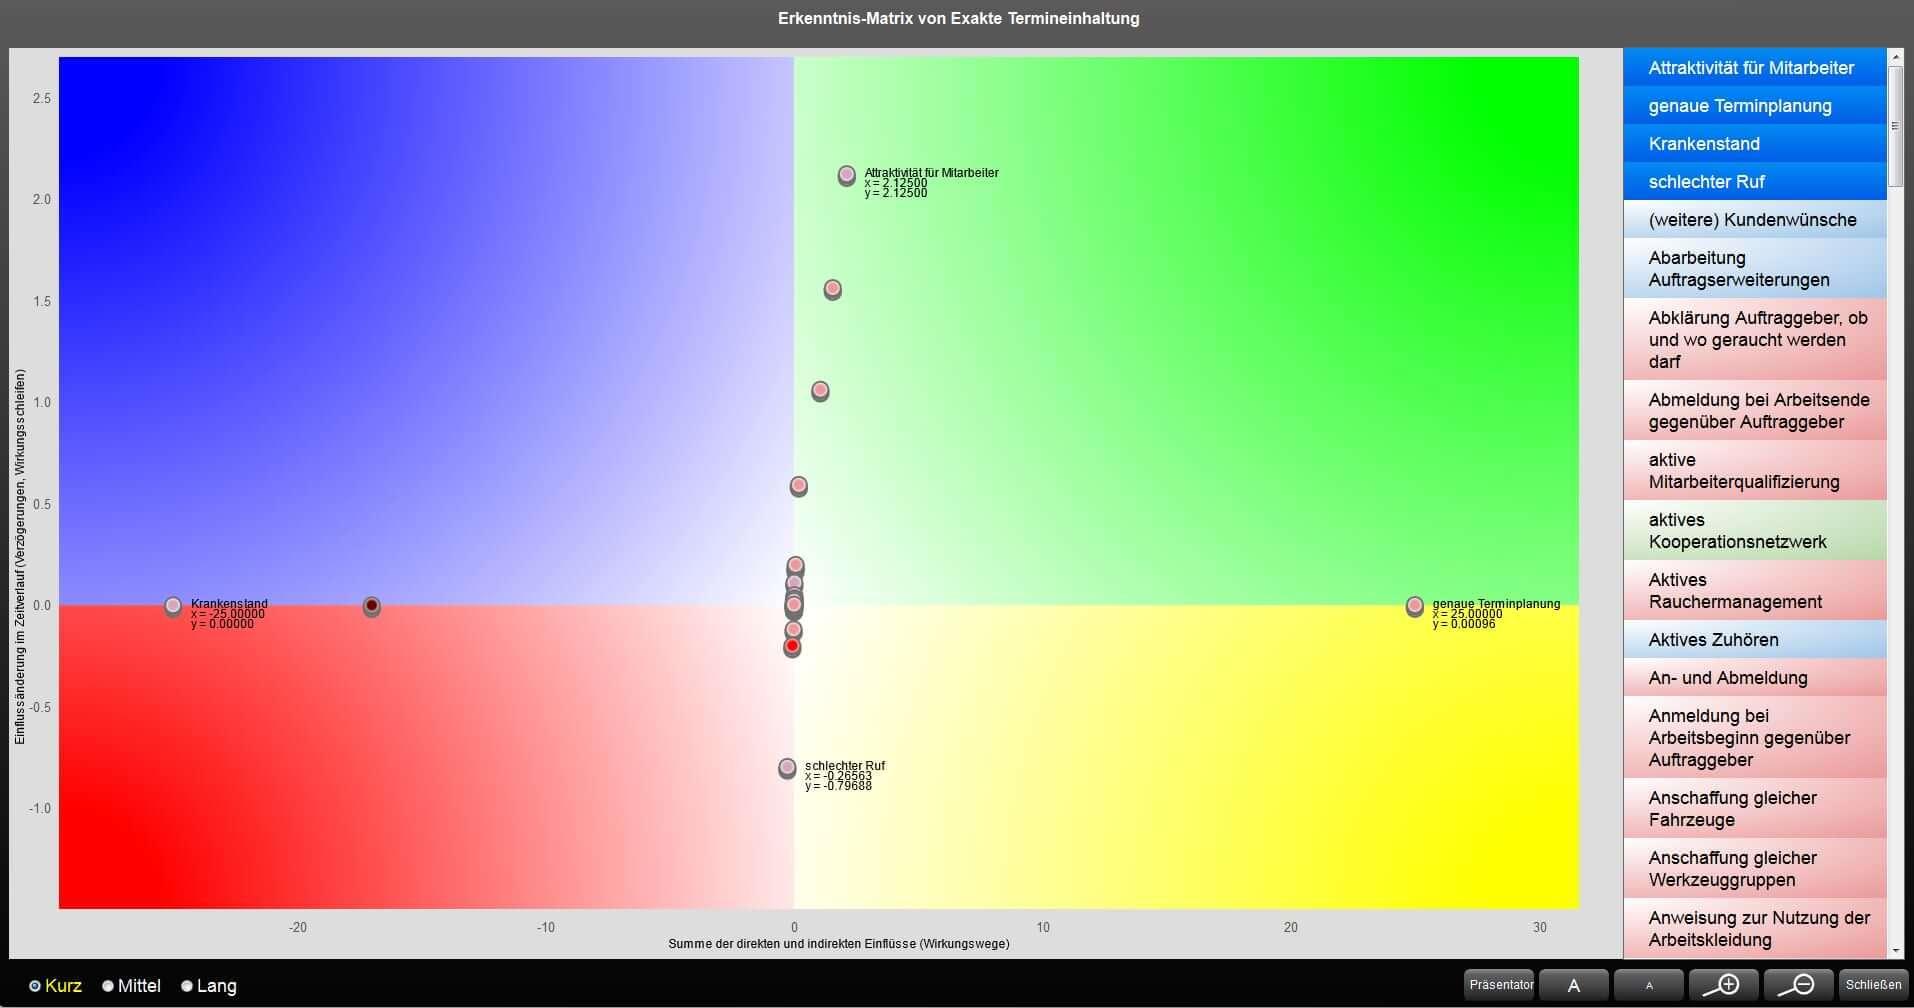 Kano Modell Erkenntnismatrix - man kommt zu des Pudels Kern